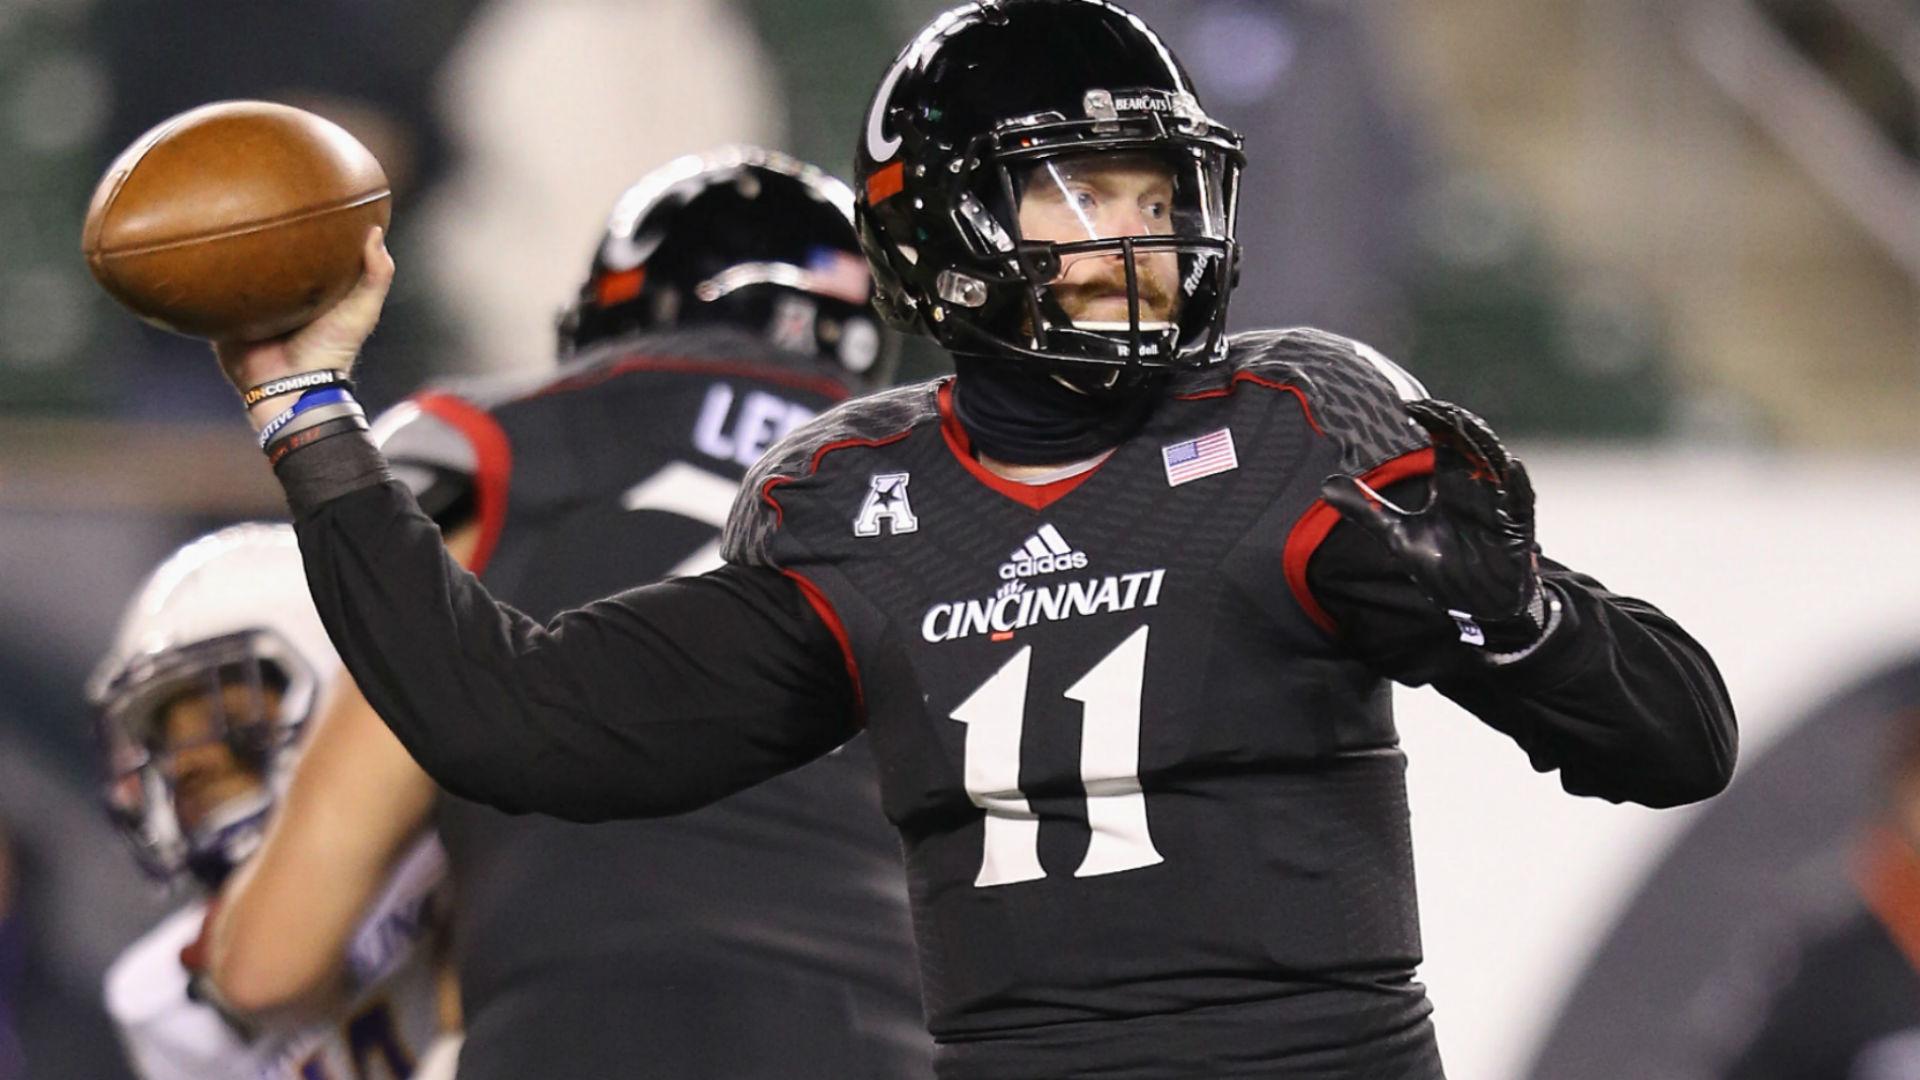 Virginia Tech vs. Cincinnati betting lines and pick –Bearcats lay short price in Military Bowl